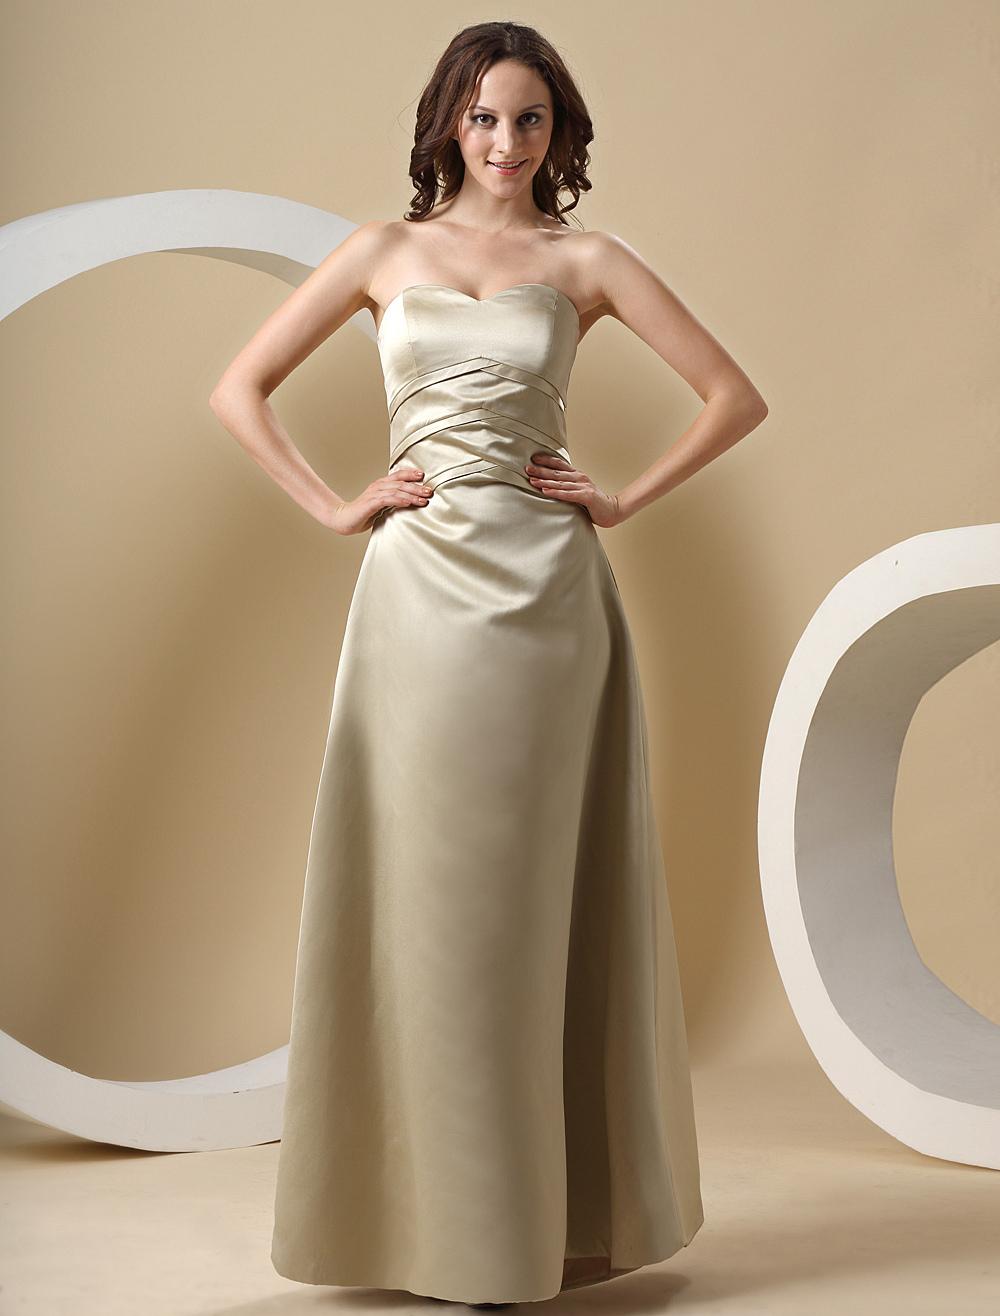 Sweetheart Strapless Satin Floor Length Bridesmaid Dress